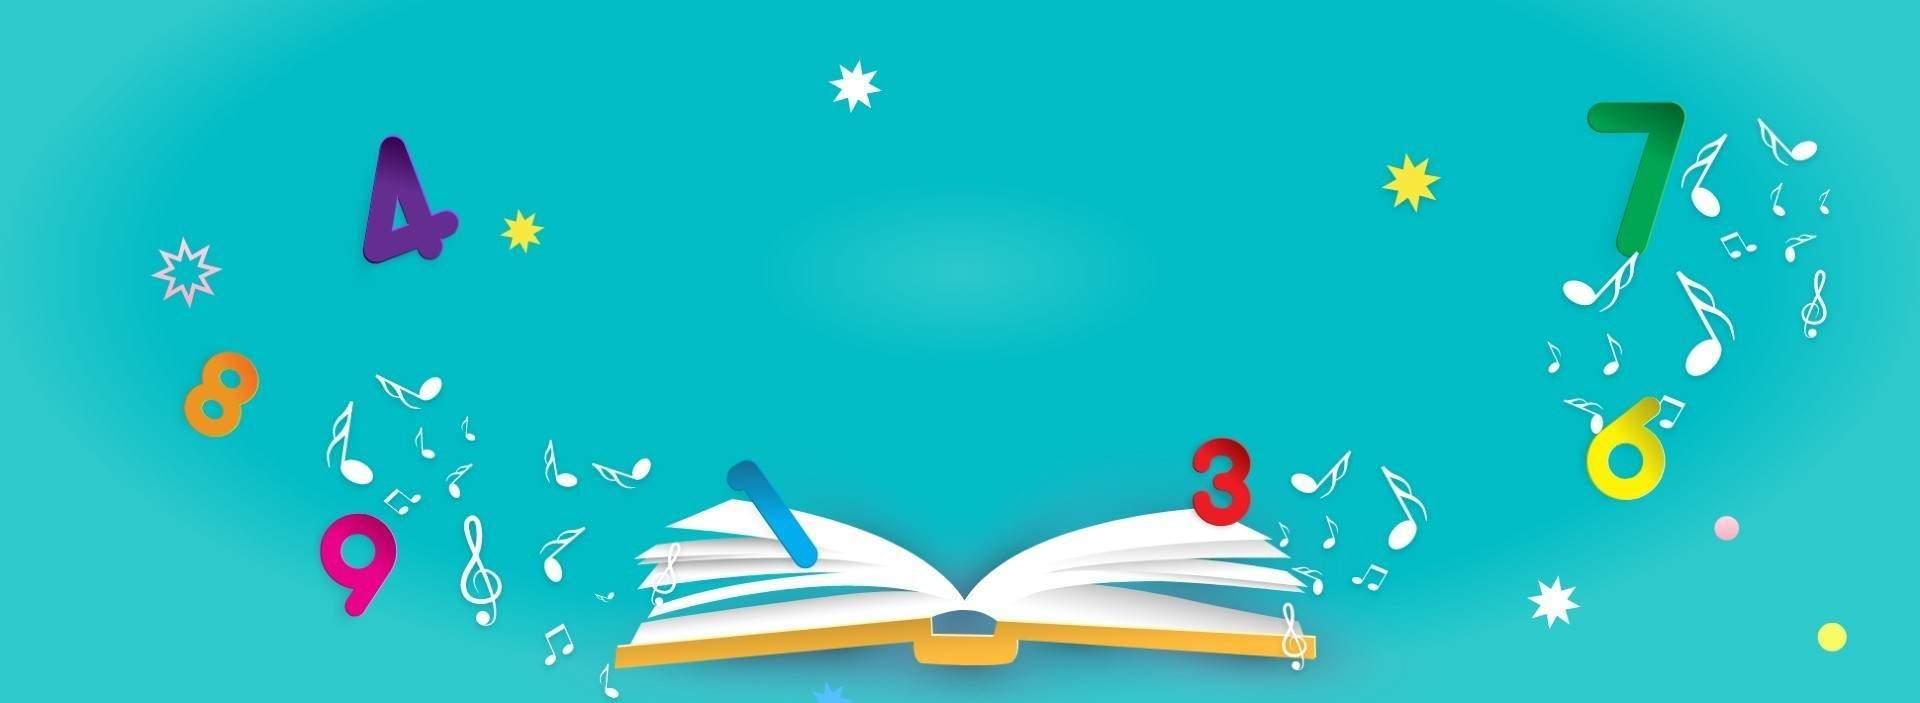 Audiolibri per bambini di matematica |Mela Music